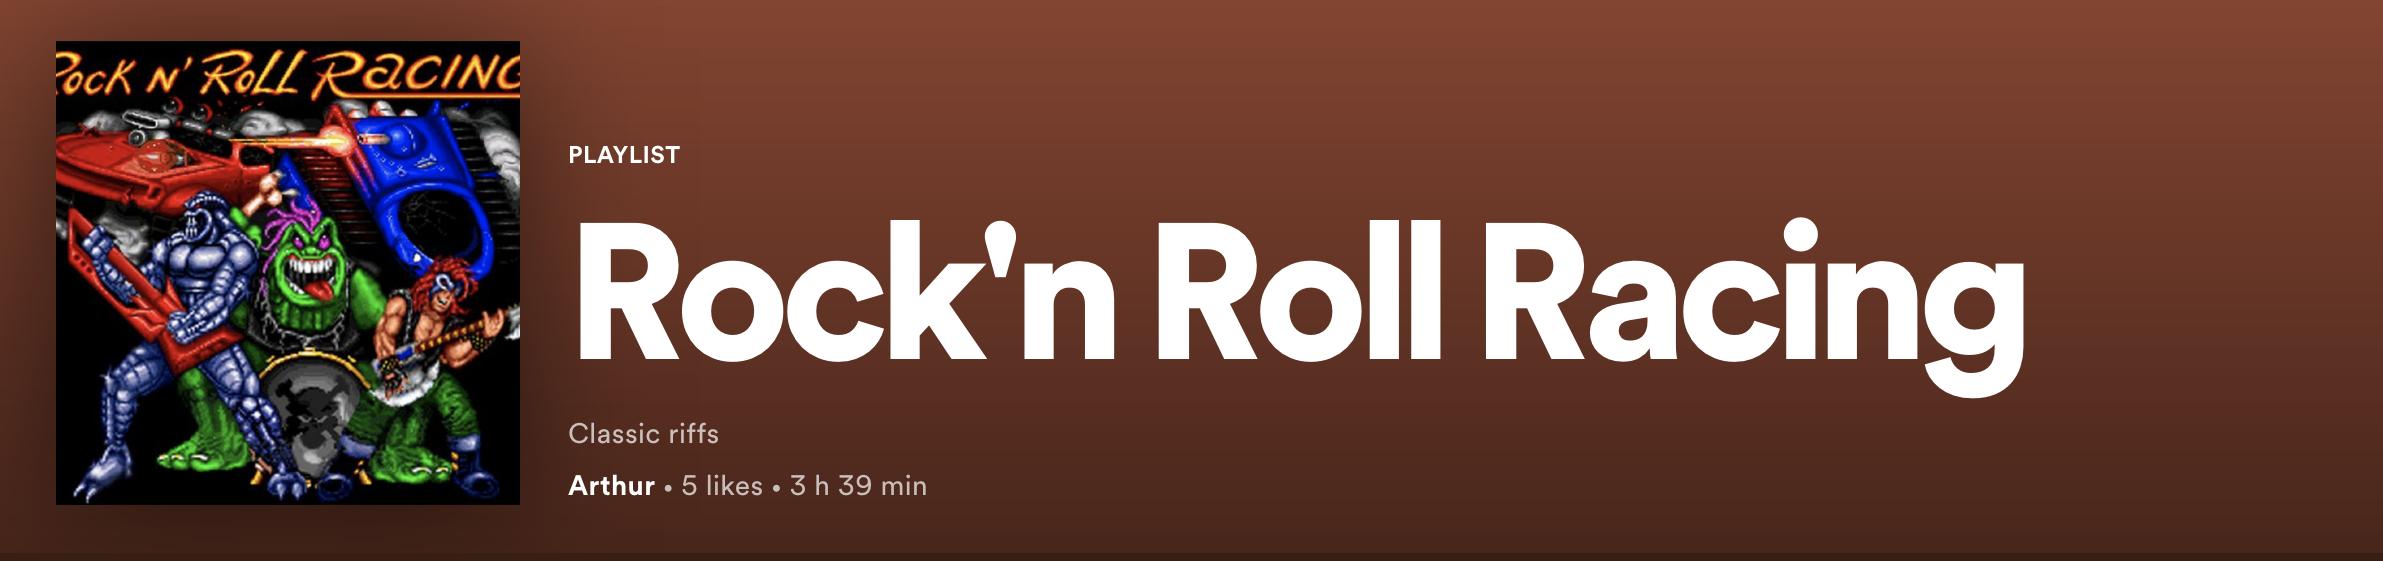 Rock n'Roll Racing Spotify